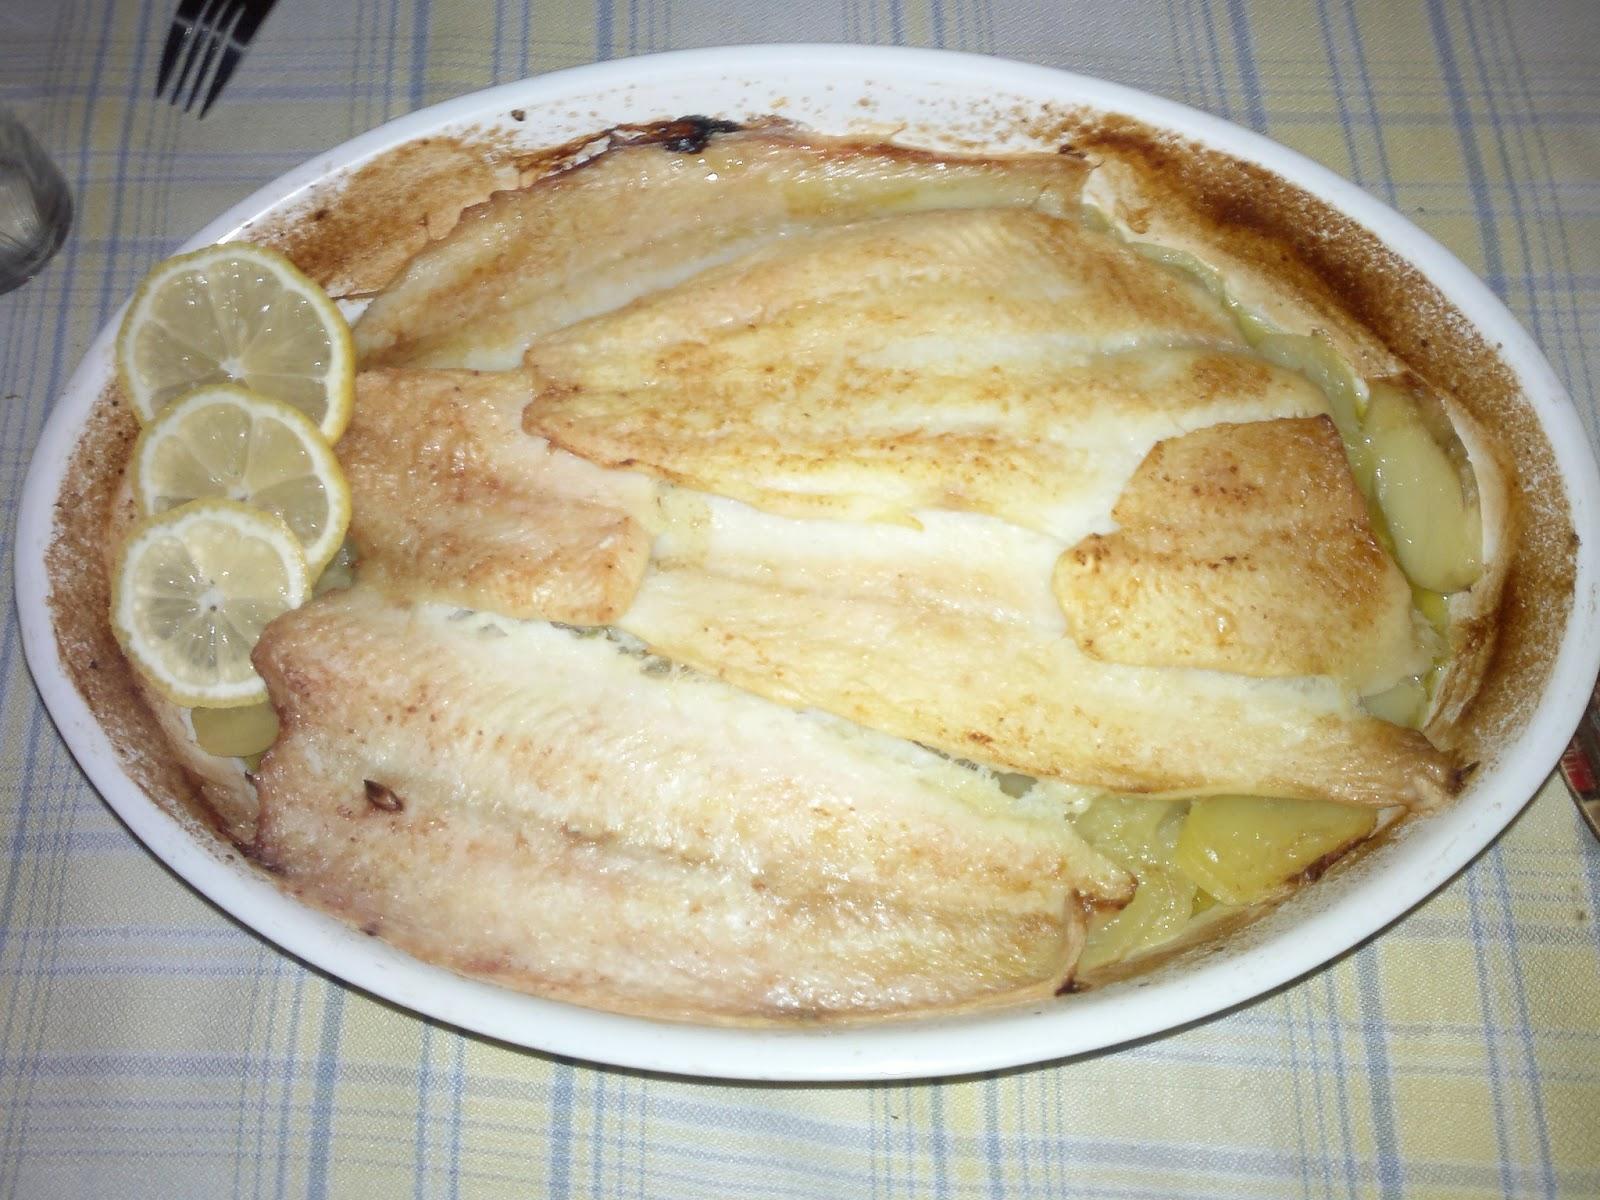 Cocinar Panga Congelada | En La Cocina Con Espe Filetes De Panga Al Horno